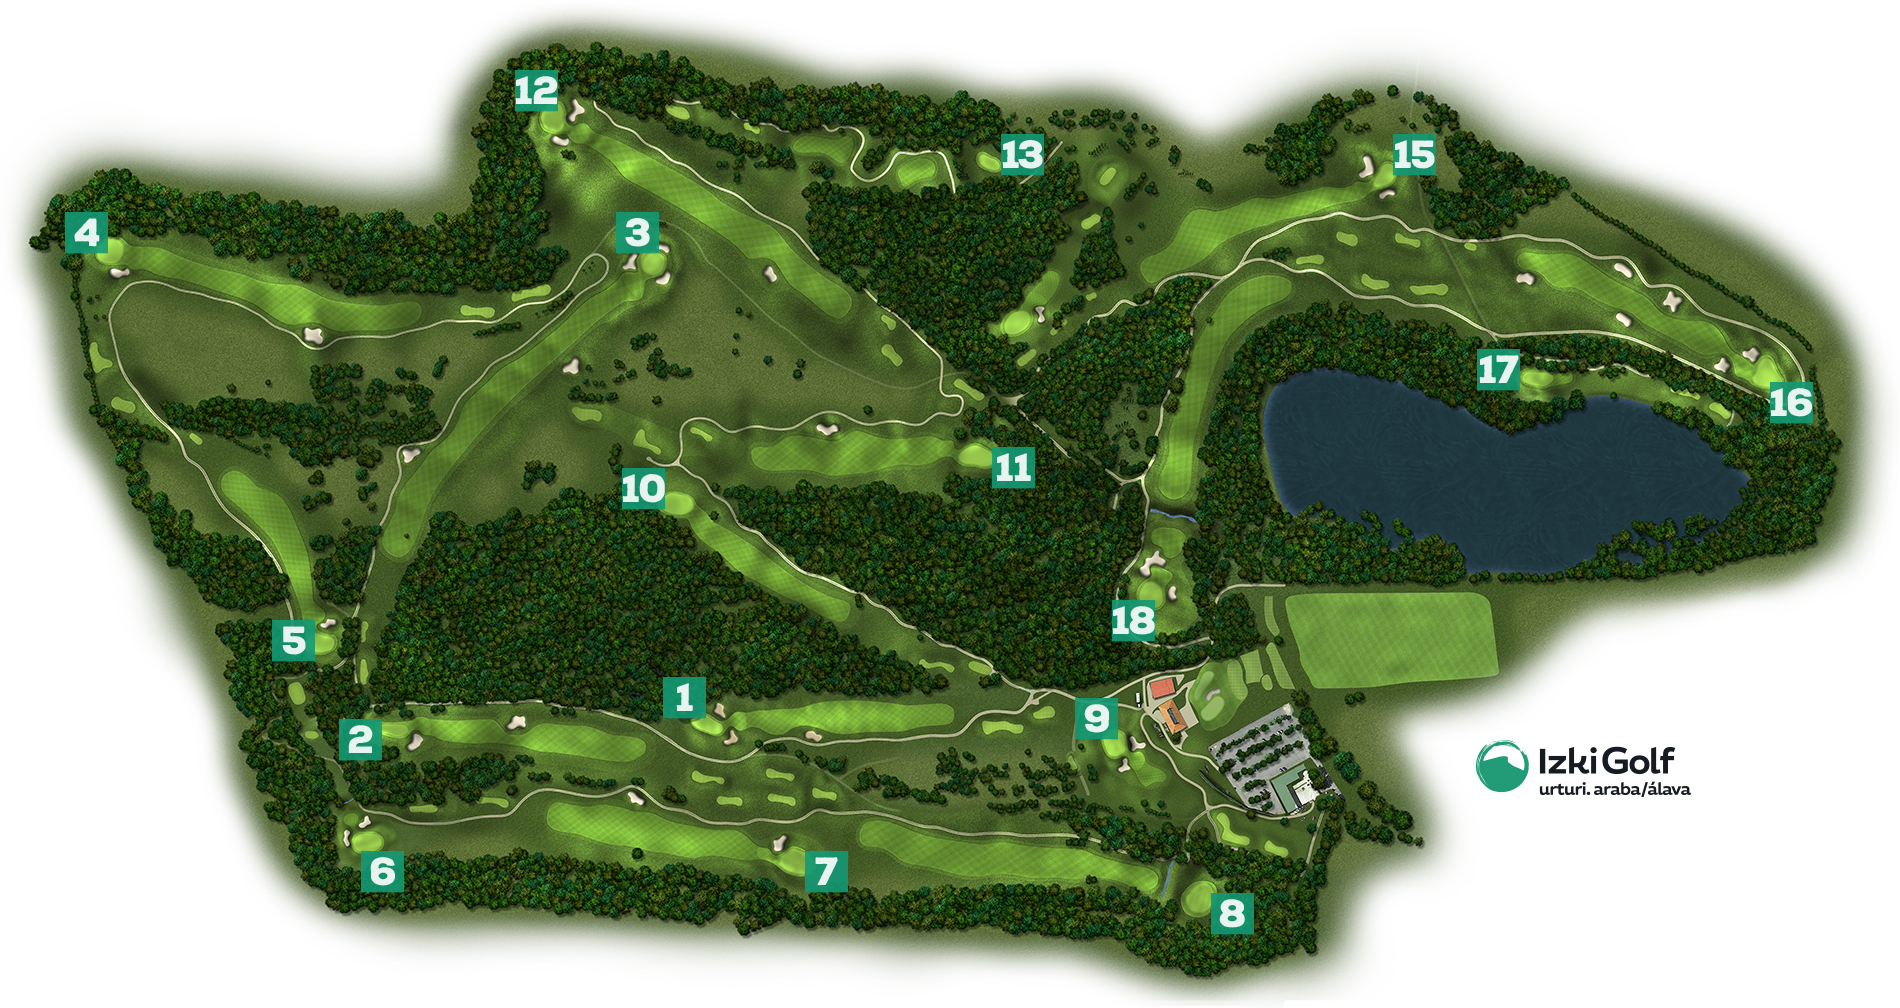 Izki Golf 18